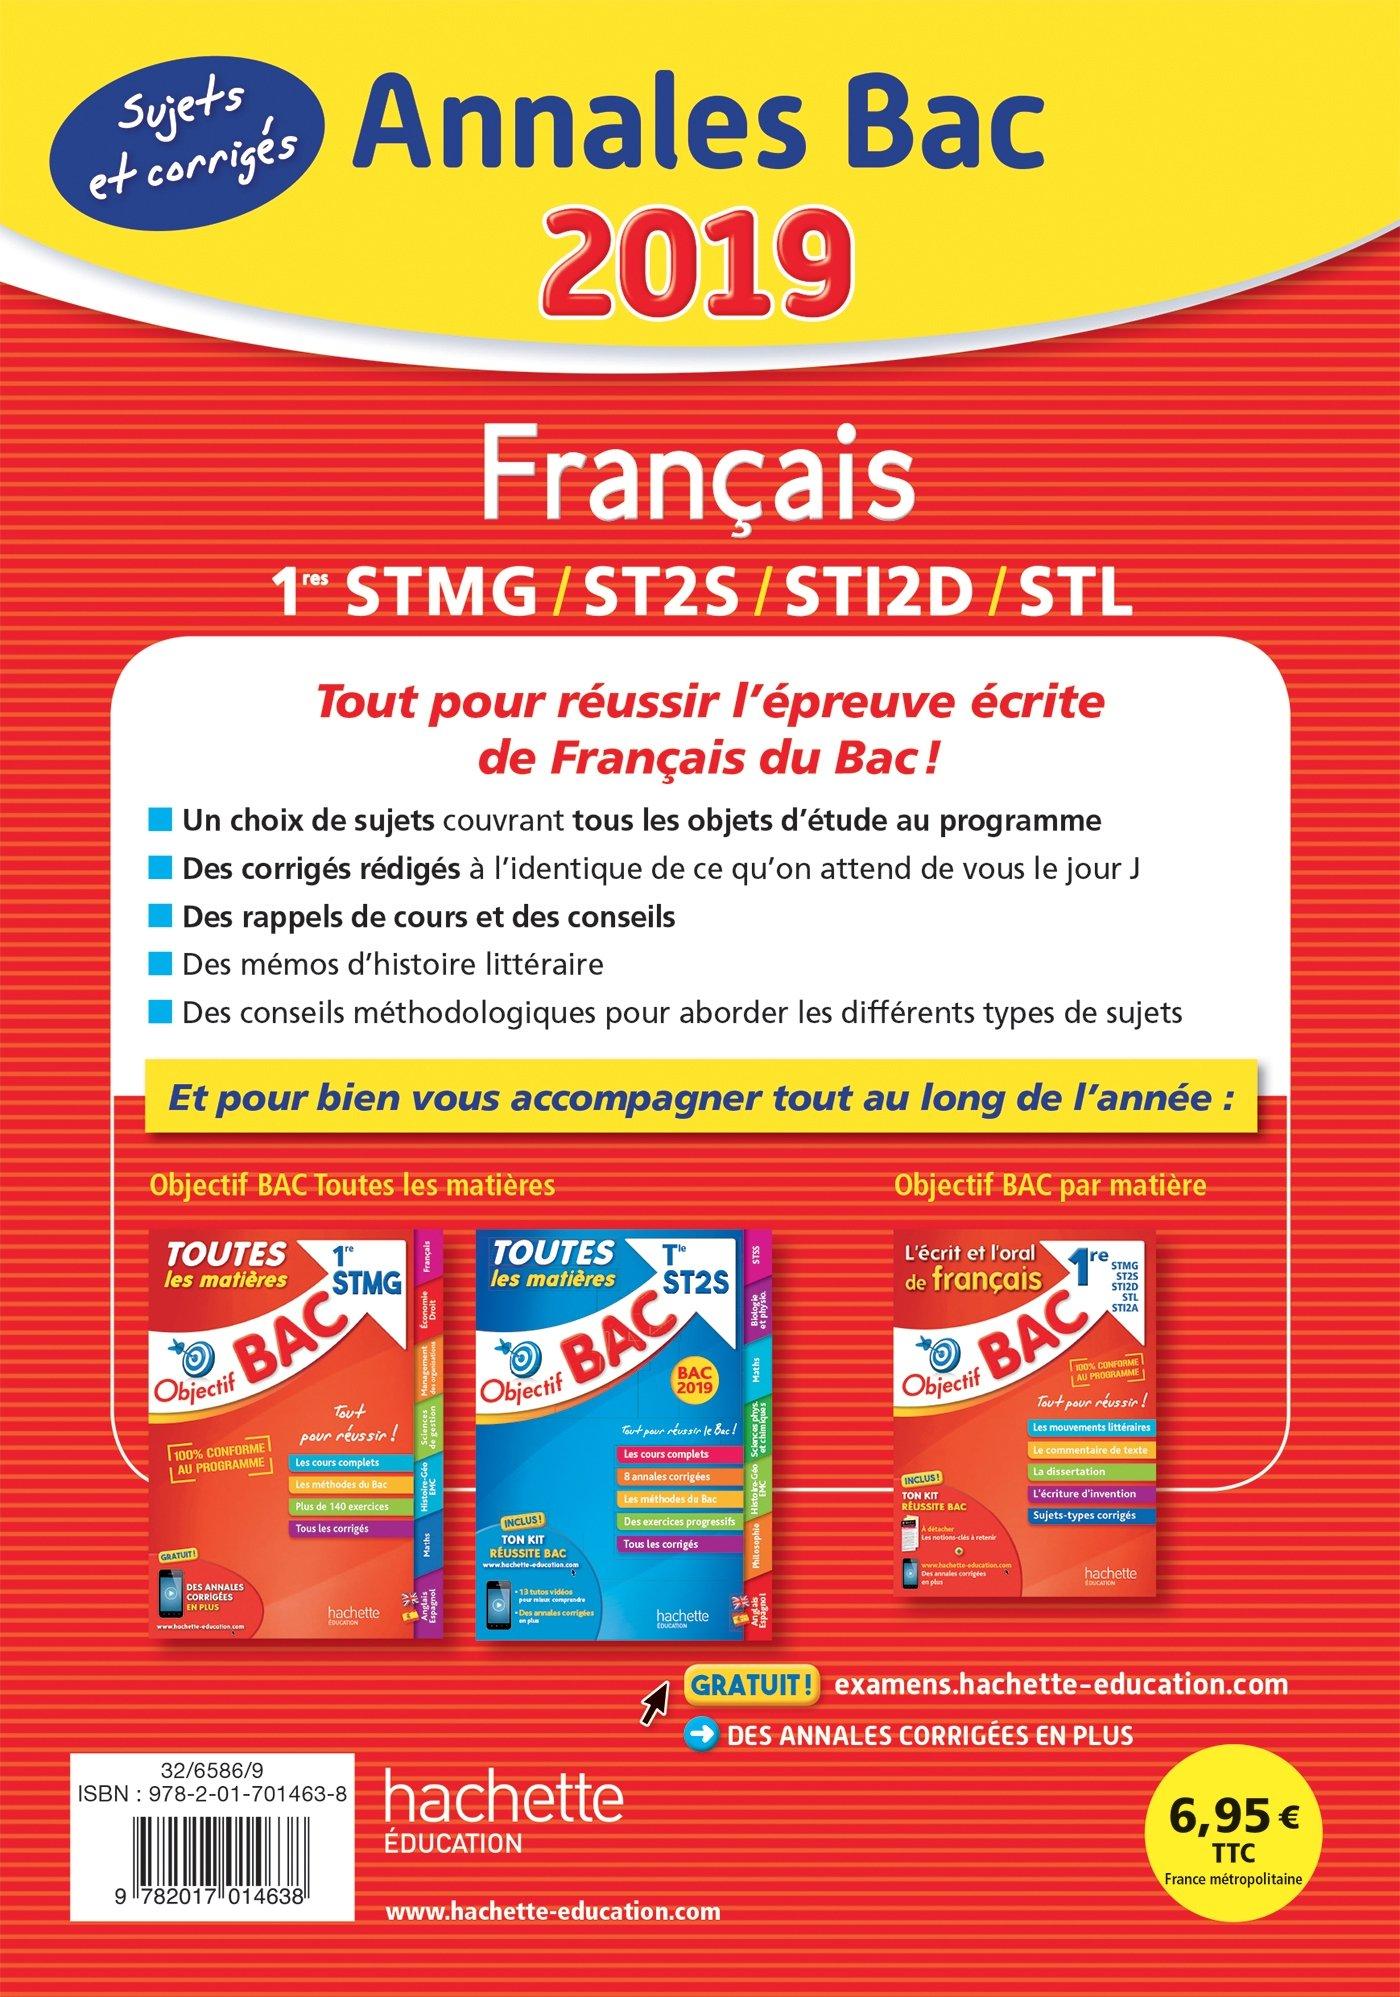 Annales BAC Francais 1res STMG/ST2S/STI2D/STL: 9782017014638: Amazon.com: Books